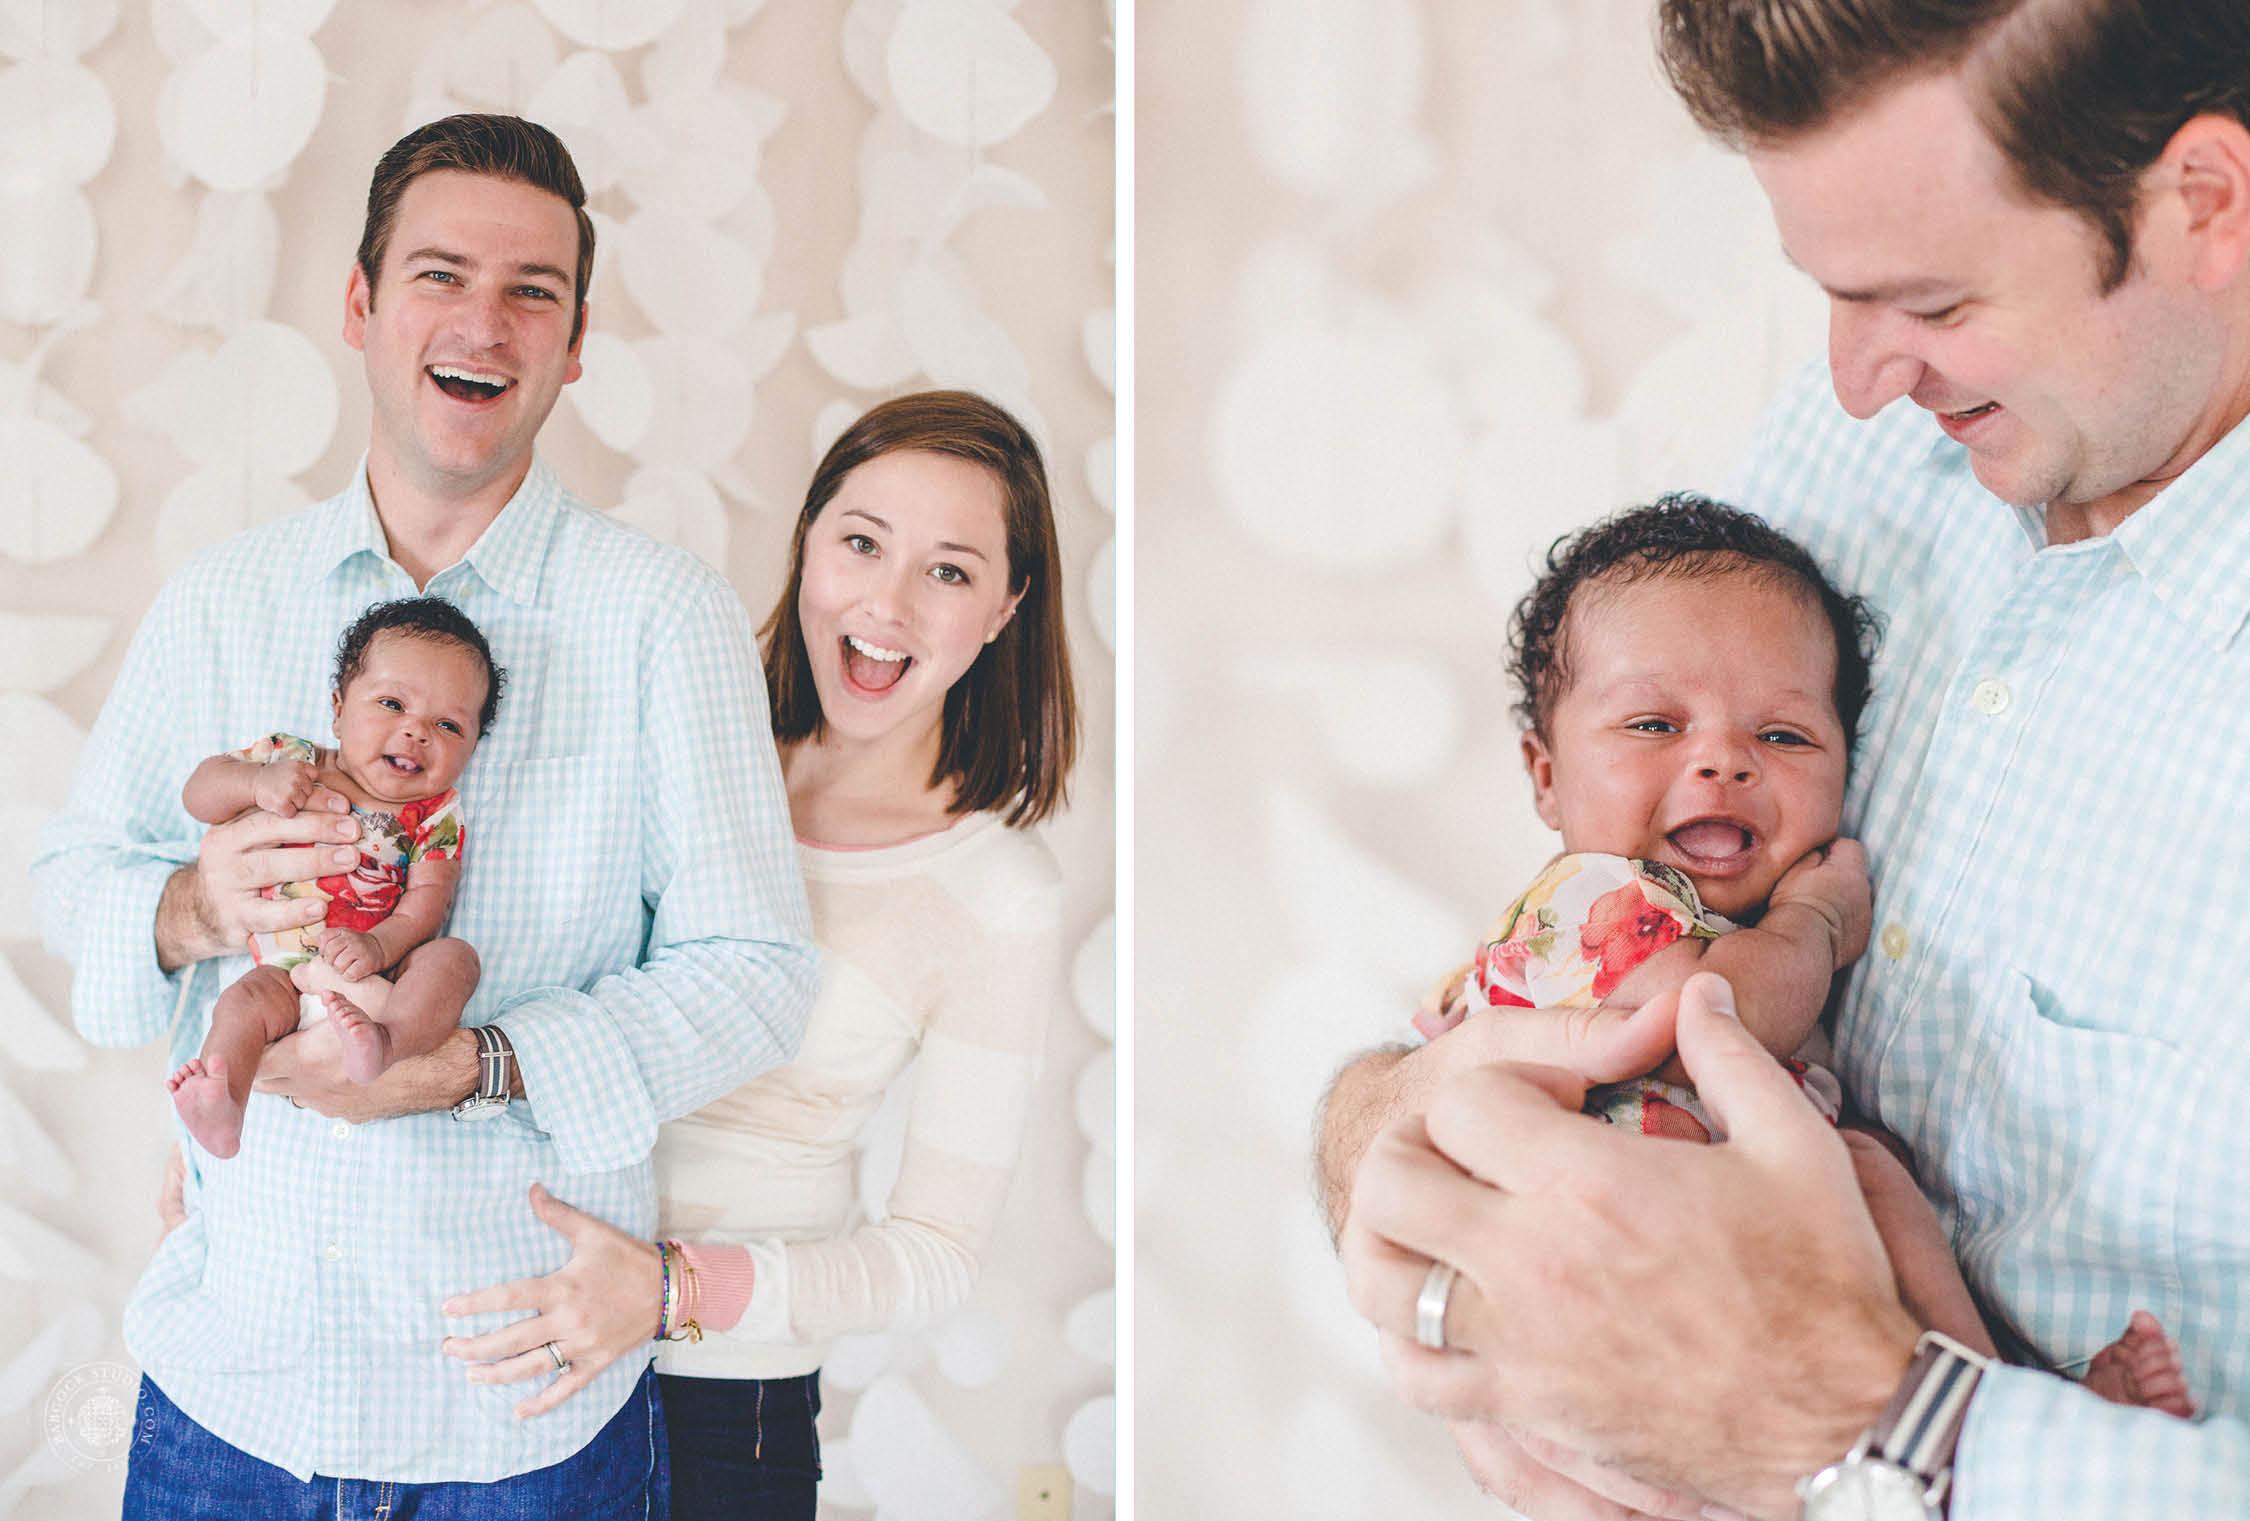 dia-newborn-adoption-photographer-dayton-ohio-5.jpg